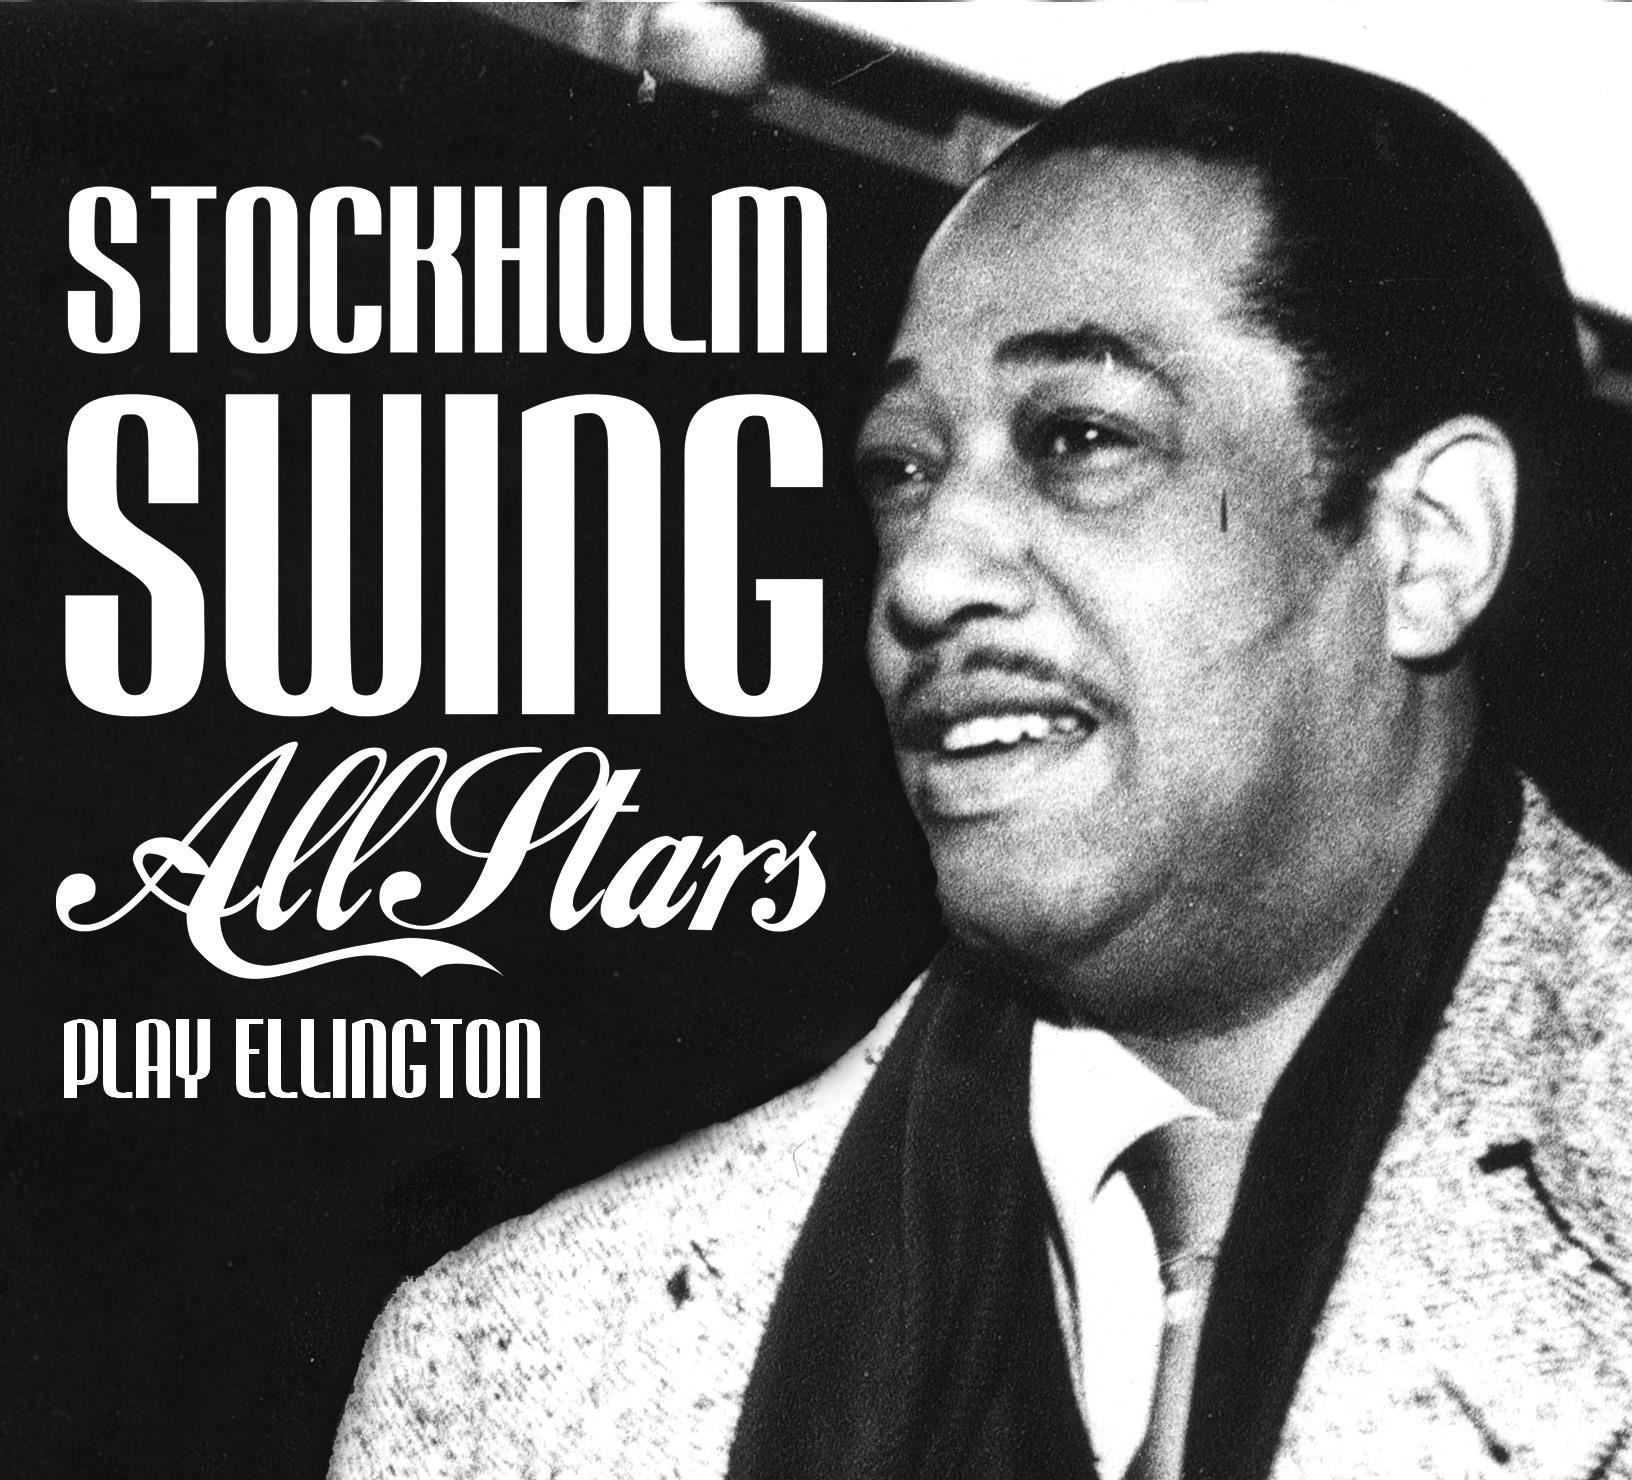 Stockholm Swing All Stars Play Ellington